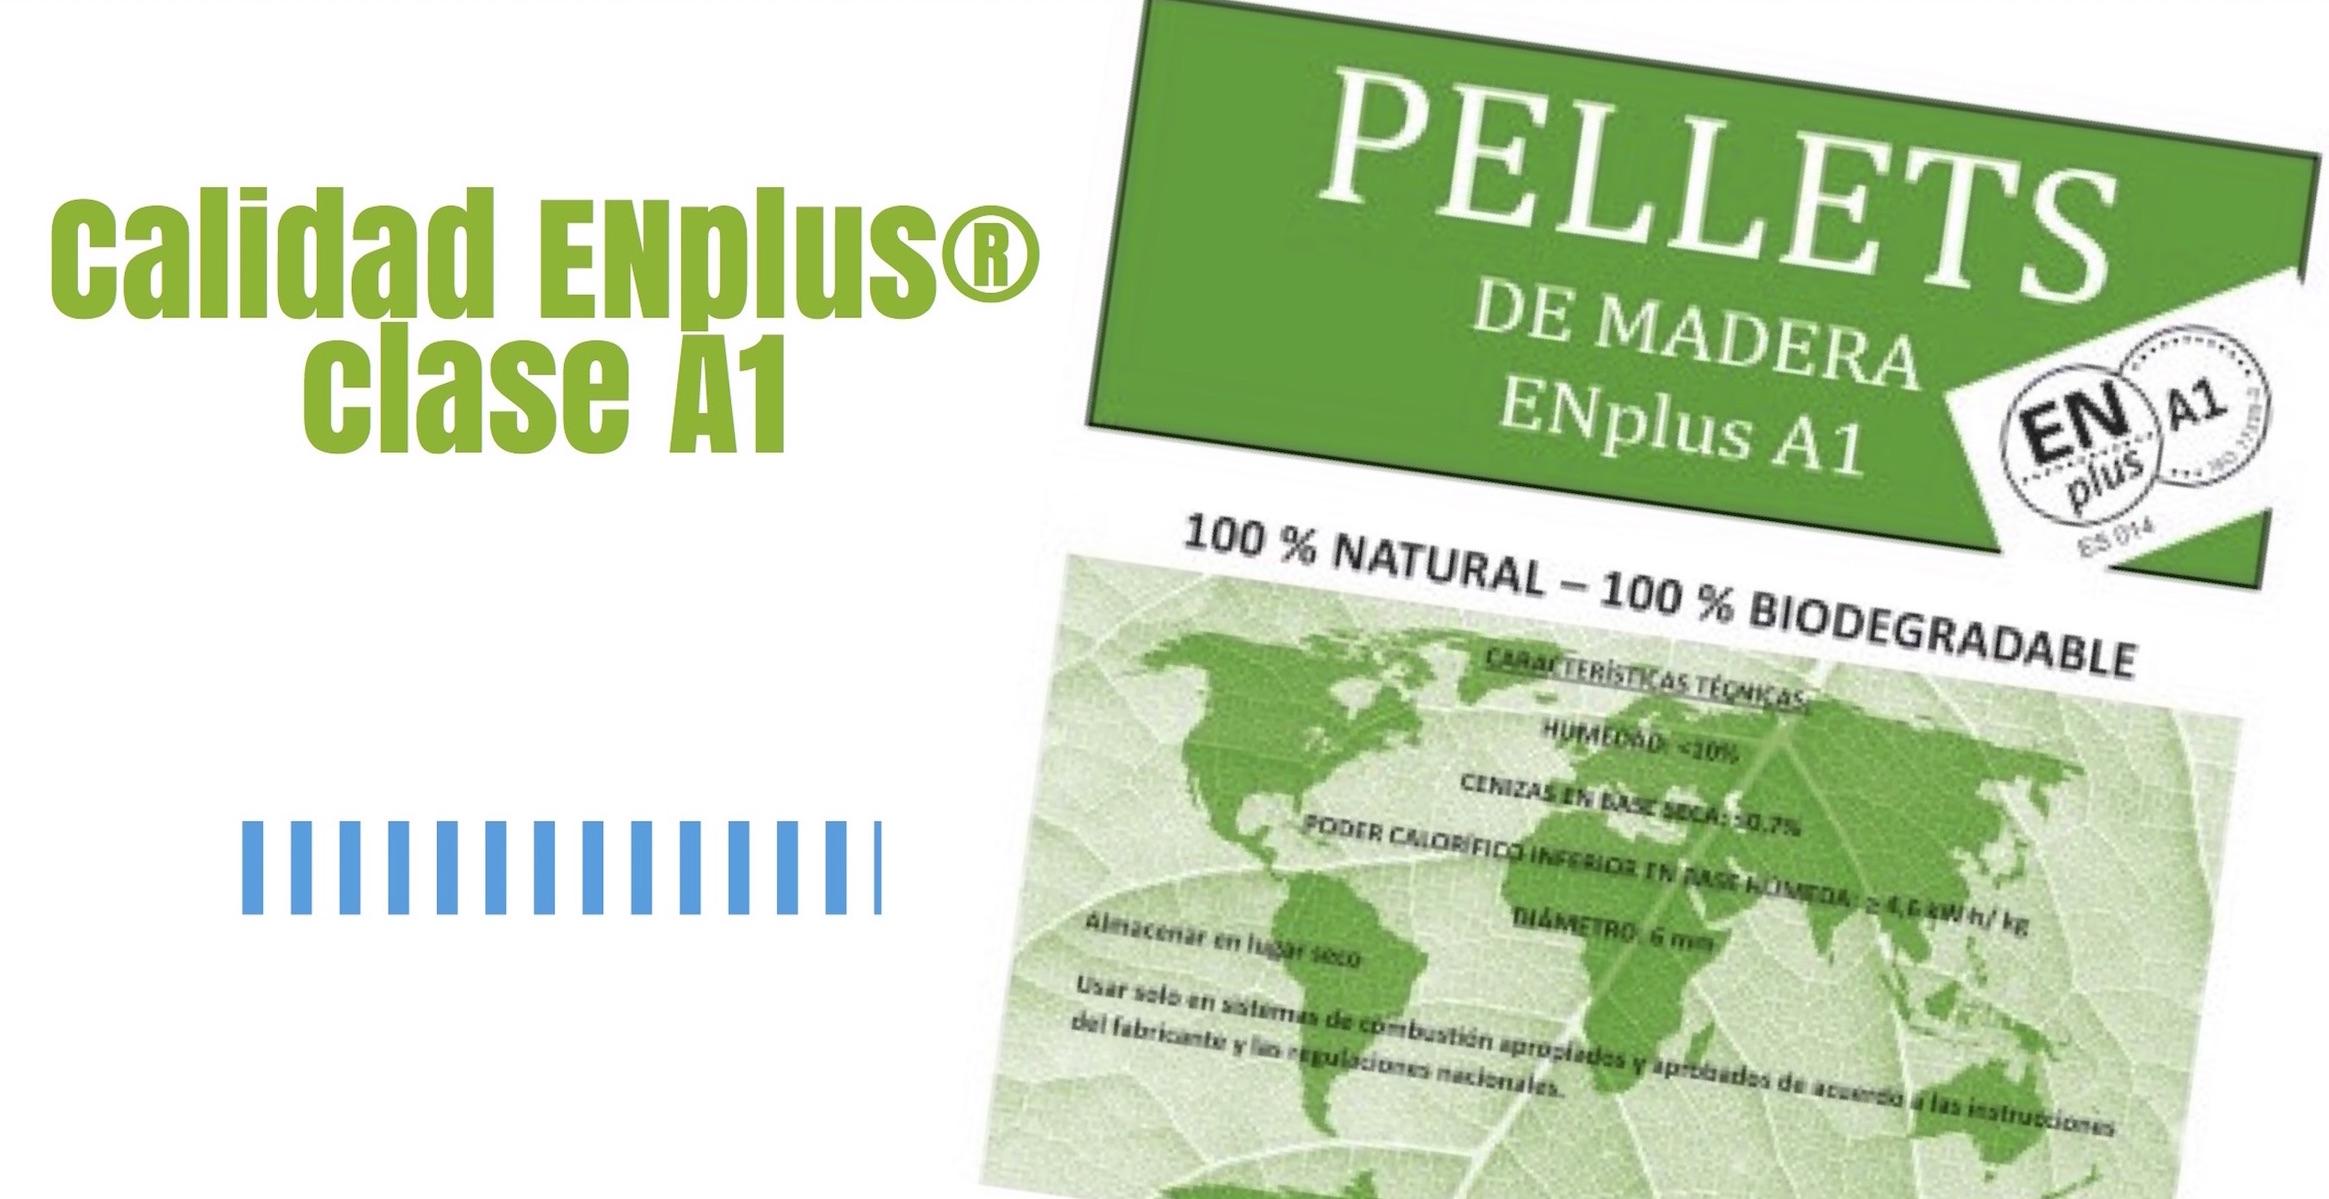 Pellets calidad ENPlus clase A1